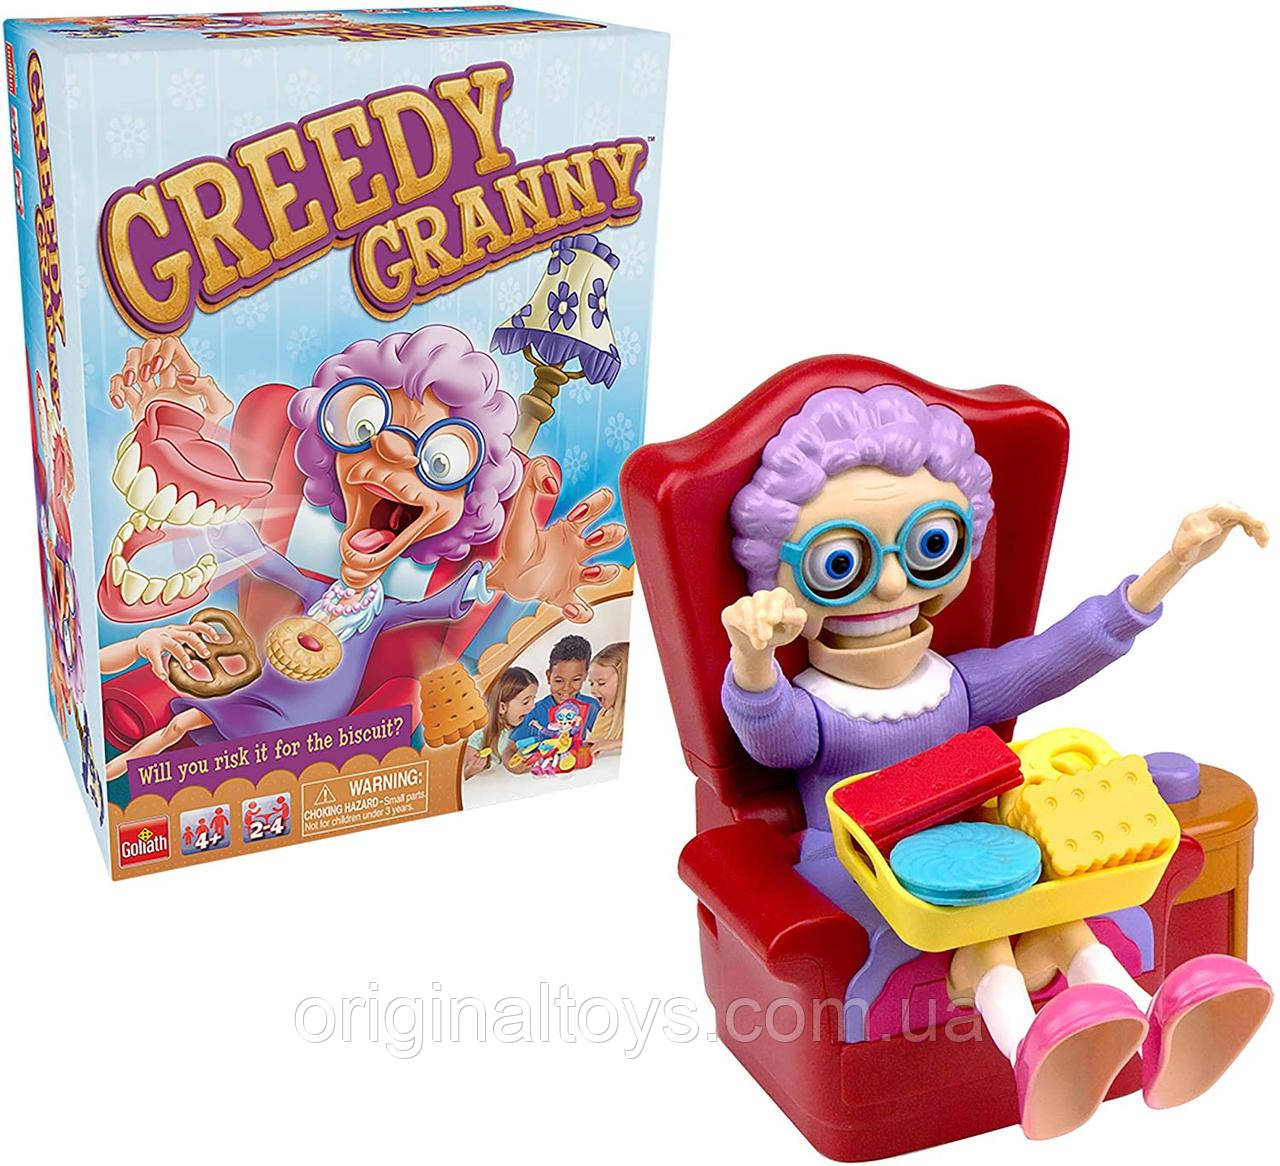 Настольная игра Greedy Granny Не Разбуди бабулю Жадная бабушка Goliath